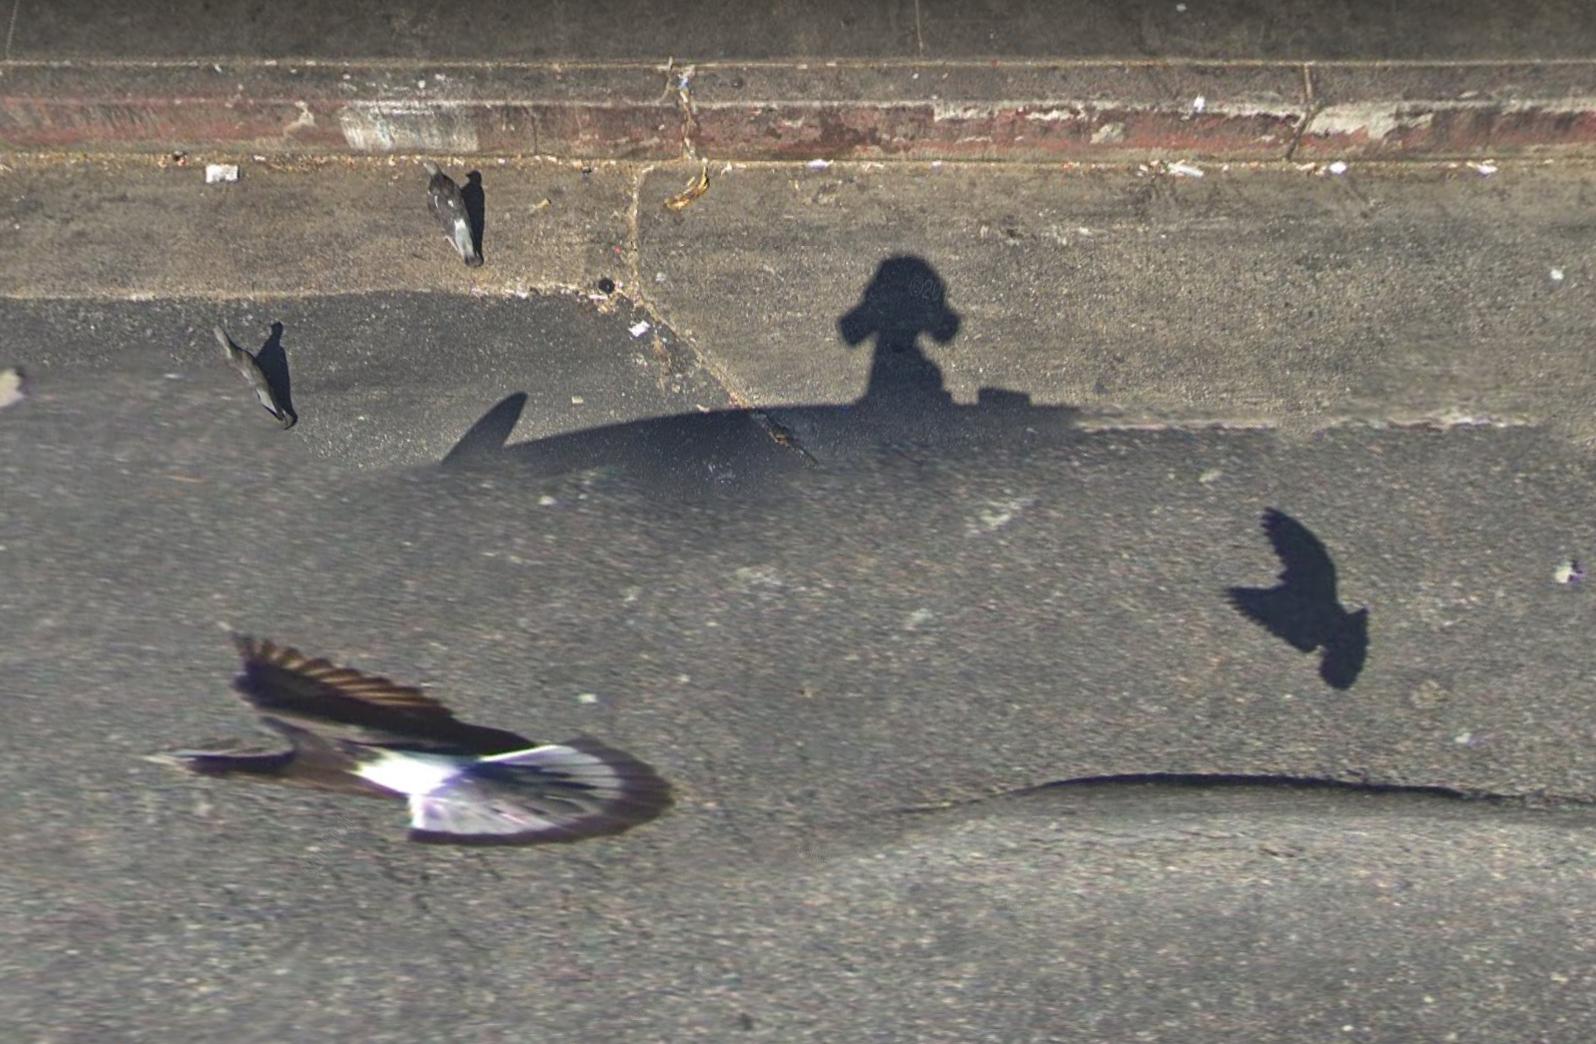 pigeons google street view camera glitch